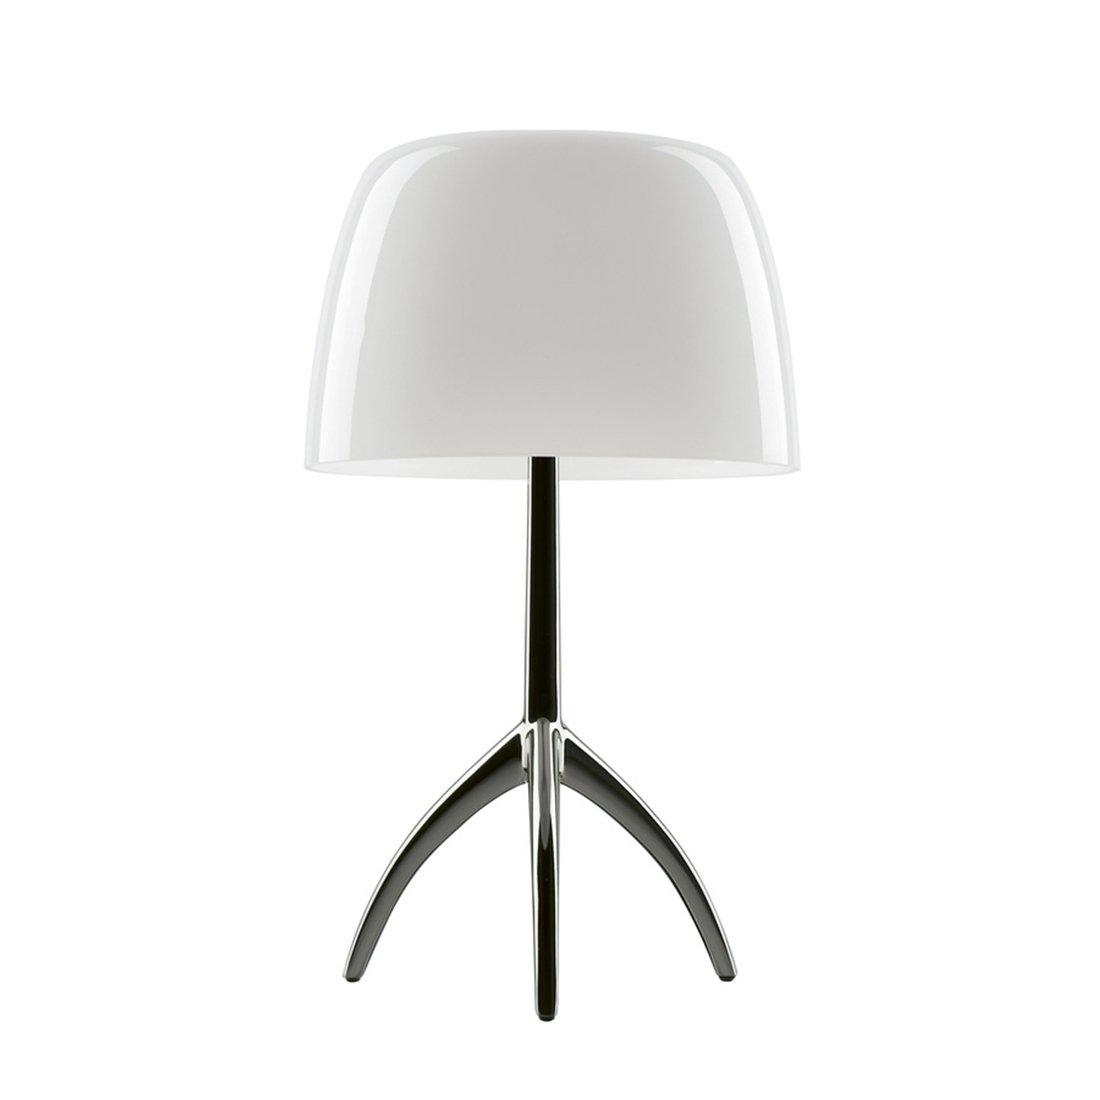 Foscarini Lumiere Piccola Tafellamp - Wit - Zwart Chroom